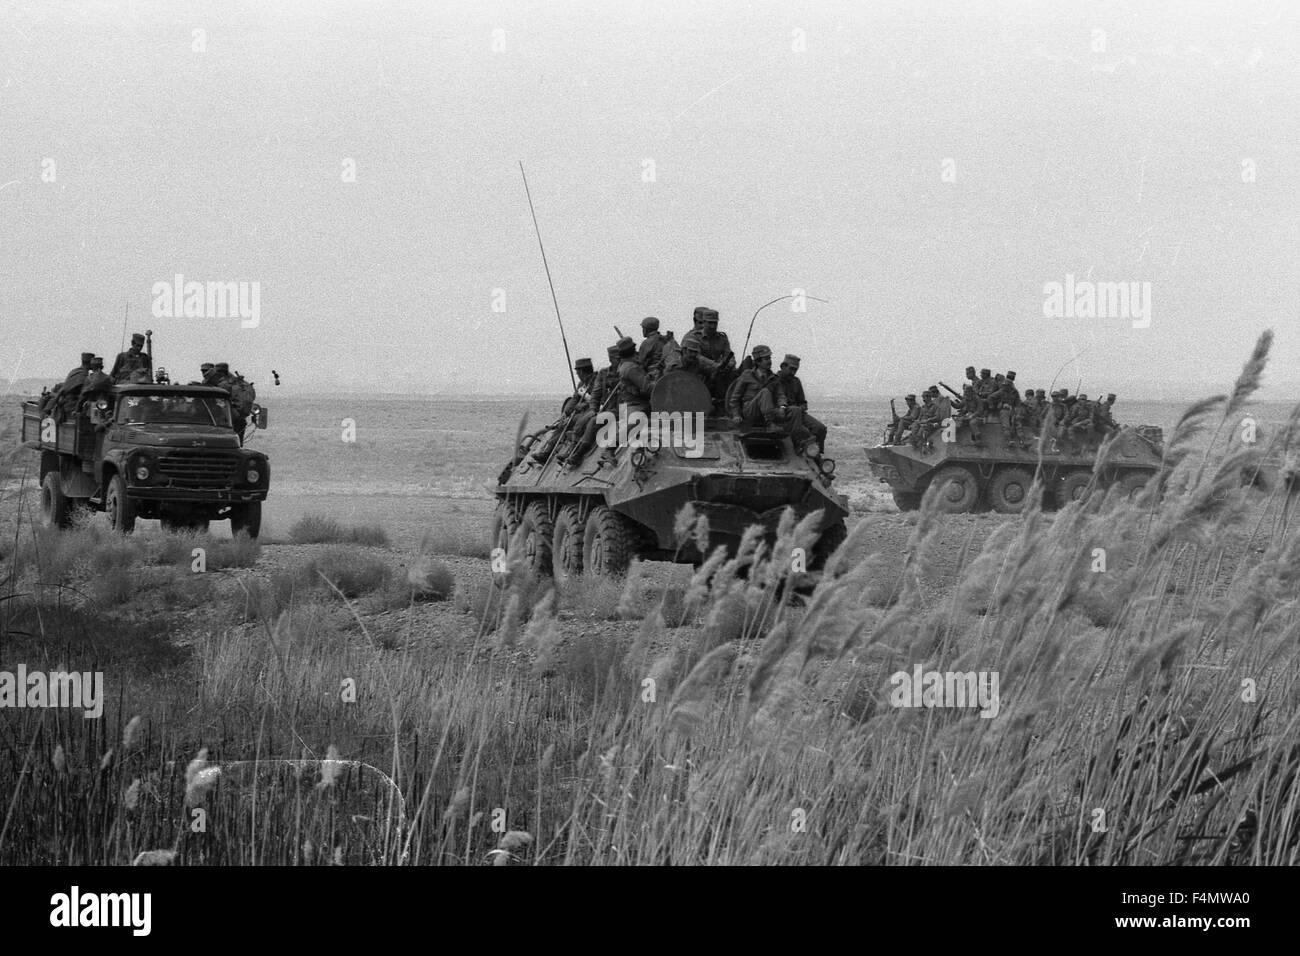 Soviet Afghanistan war - Page 6 Afghanistan-the-soviet-military-technics-on-road-to-kandahar-F4MWA0